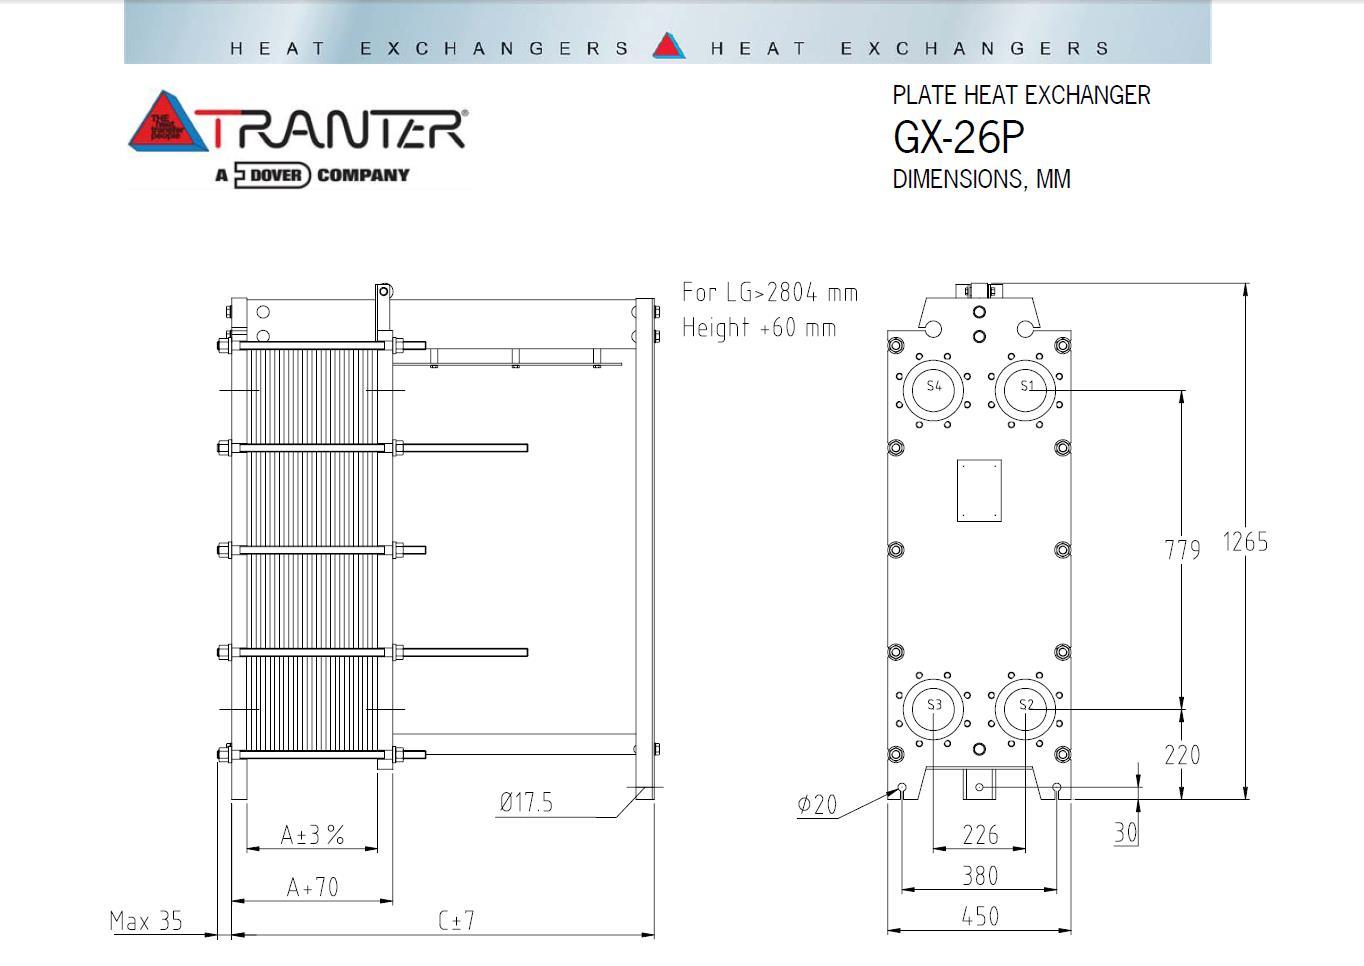 Tranter gx 26 Кожухотрубный конденсатор Alfa Laval CRF403-6-M 2P Набережные Челны